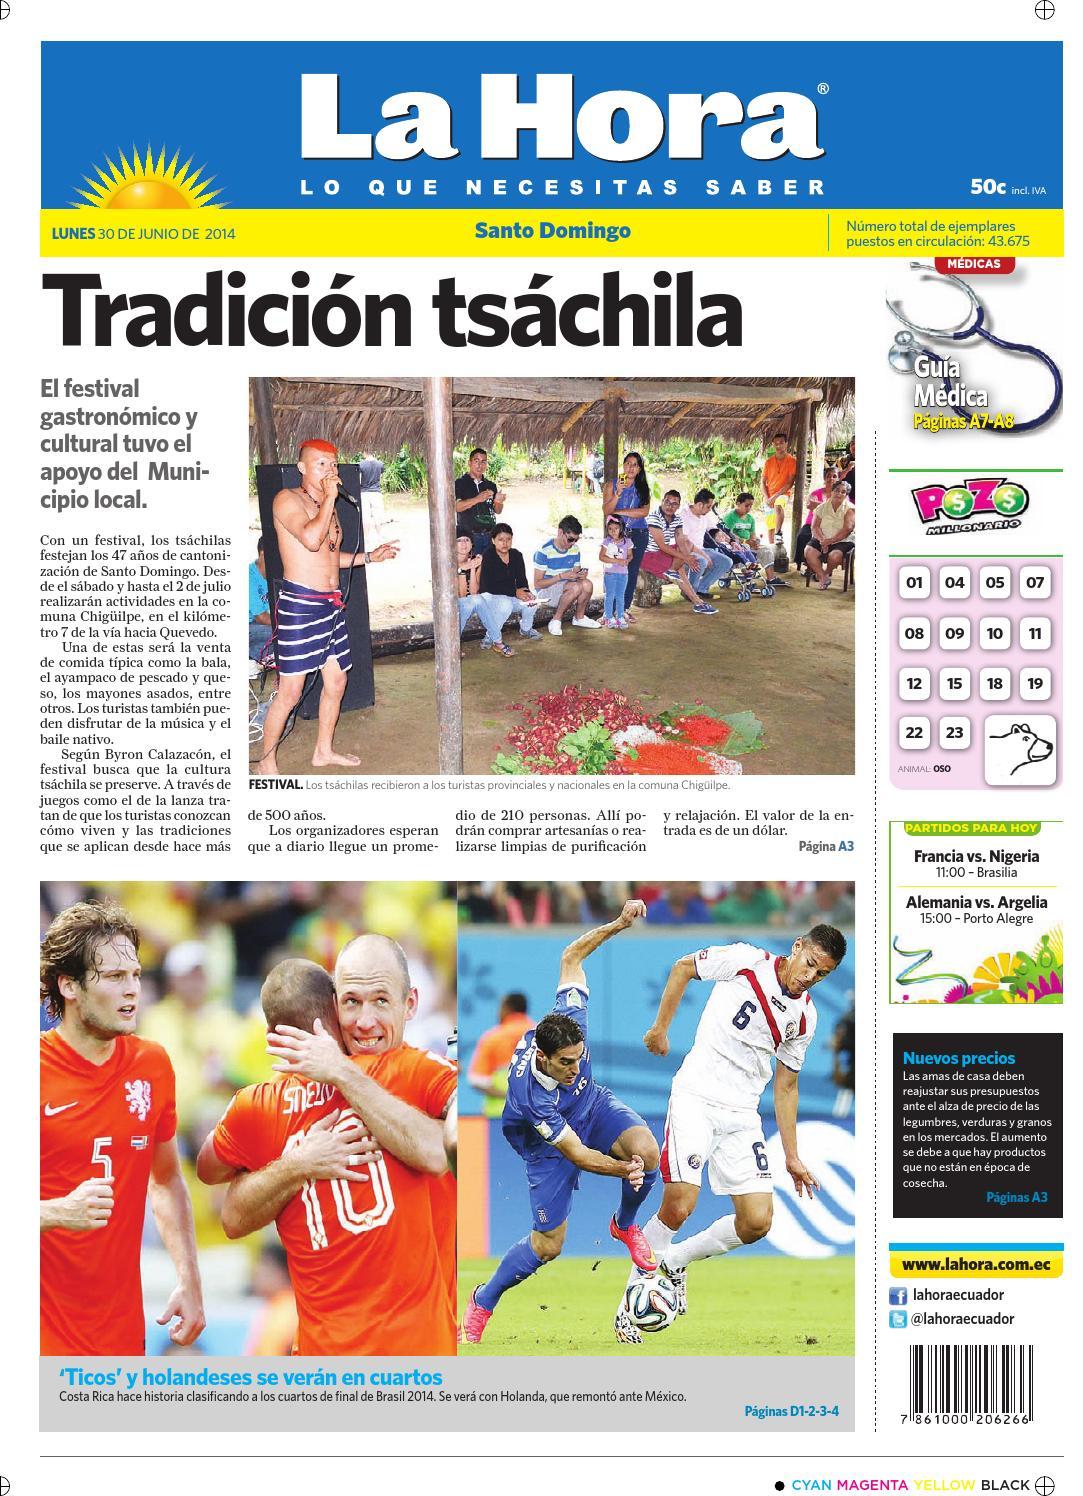 Santo Domingo 30 junio 2014 by Diario La Hora Ecuador - issuu f583d8d5217e6